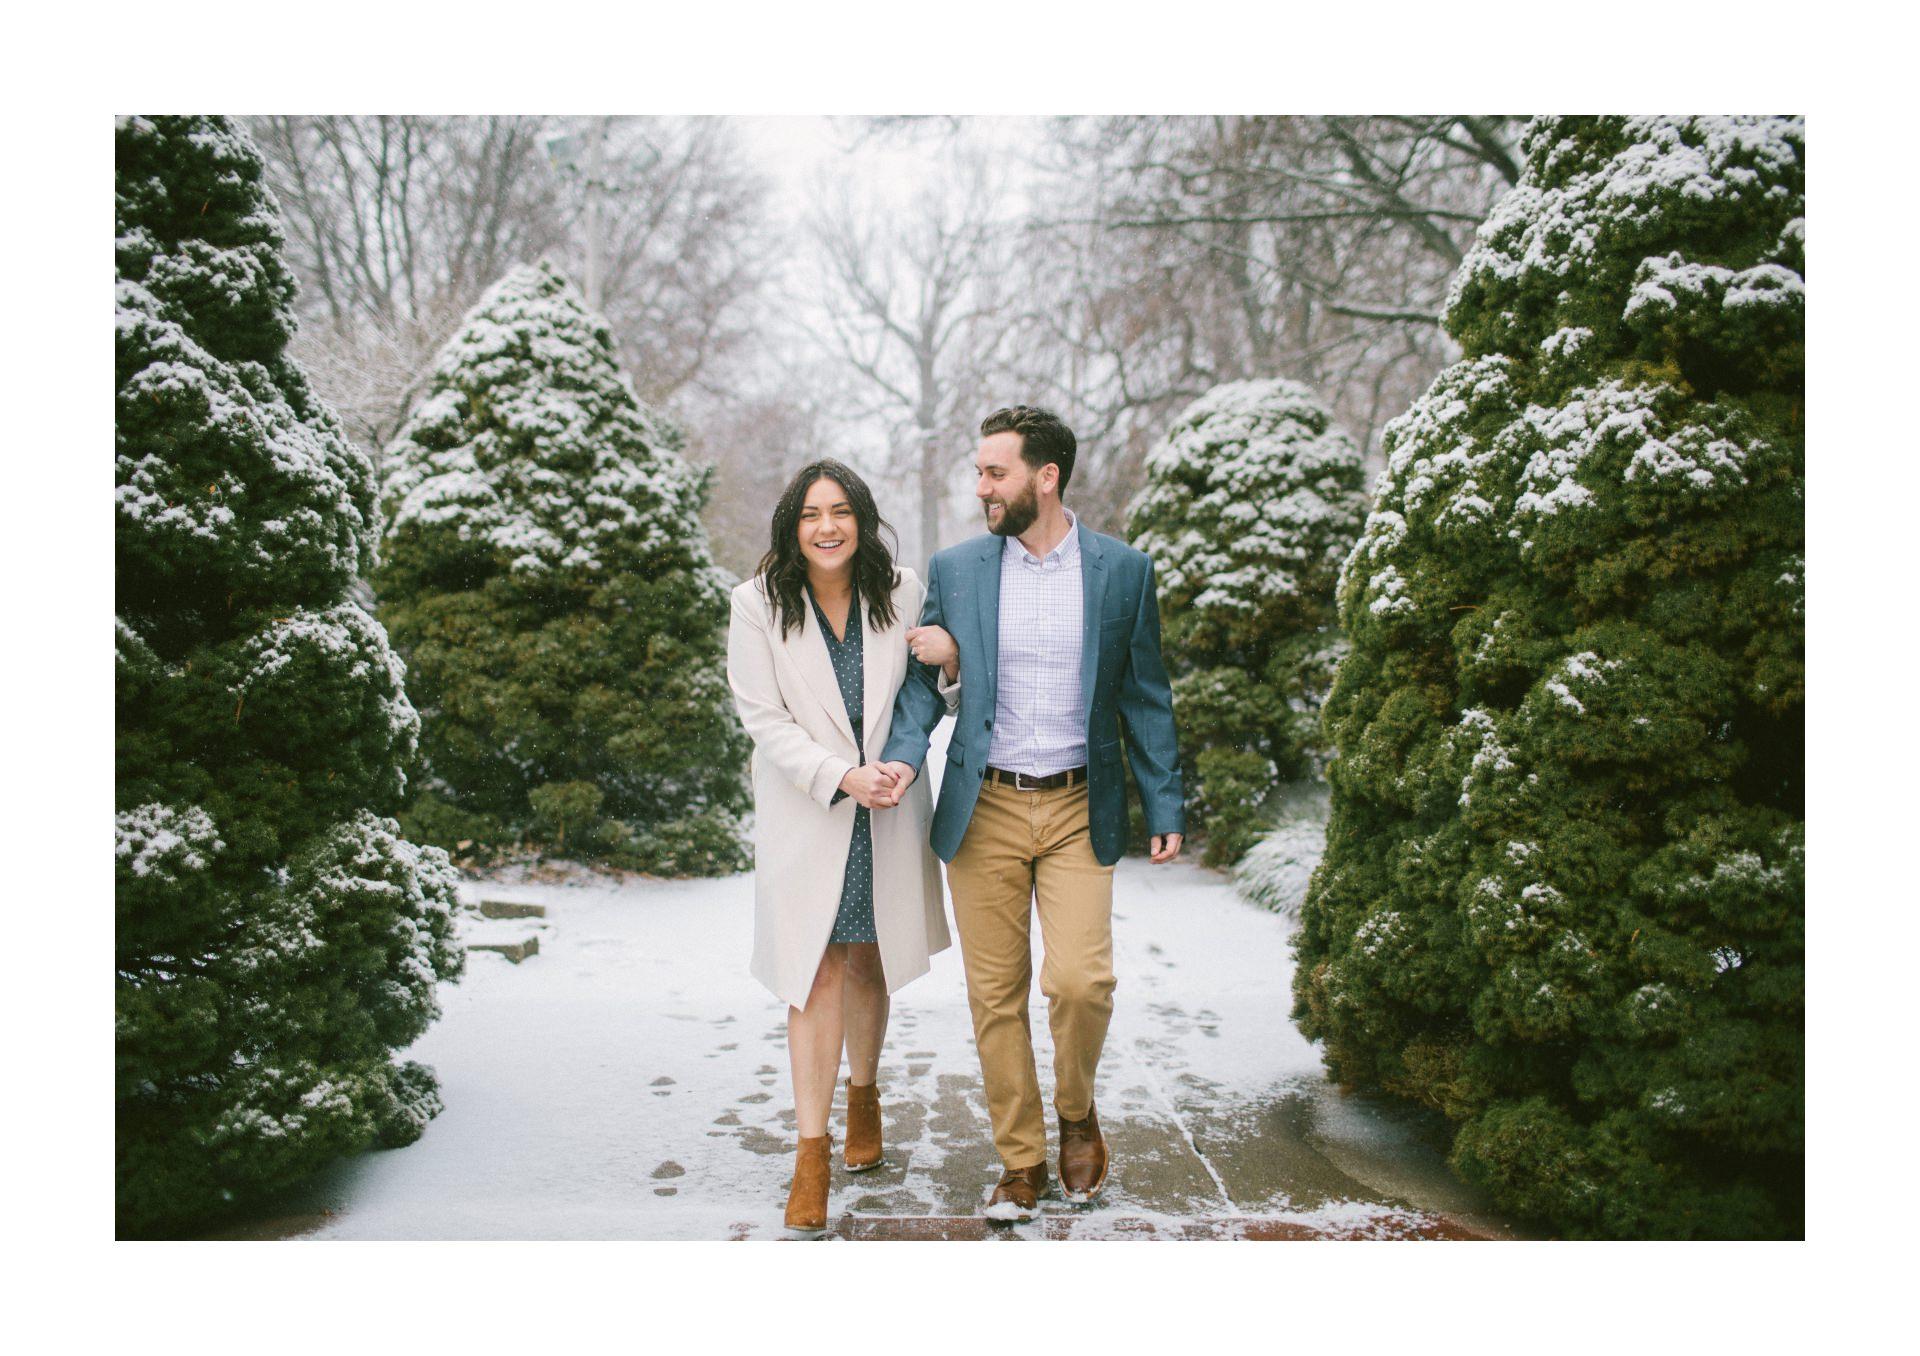 Cleveland Winter Engagement Session 2 4.jpg